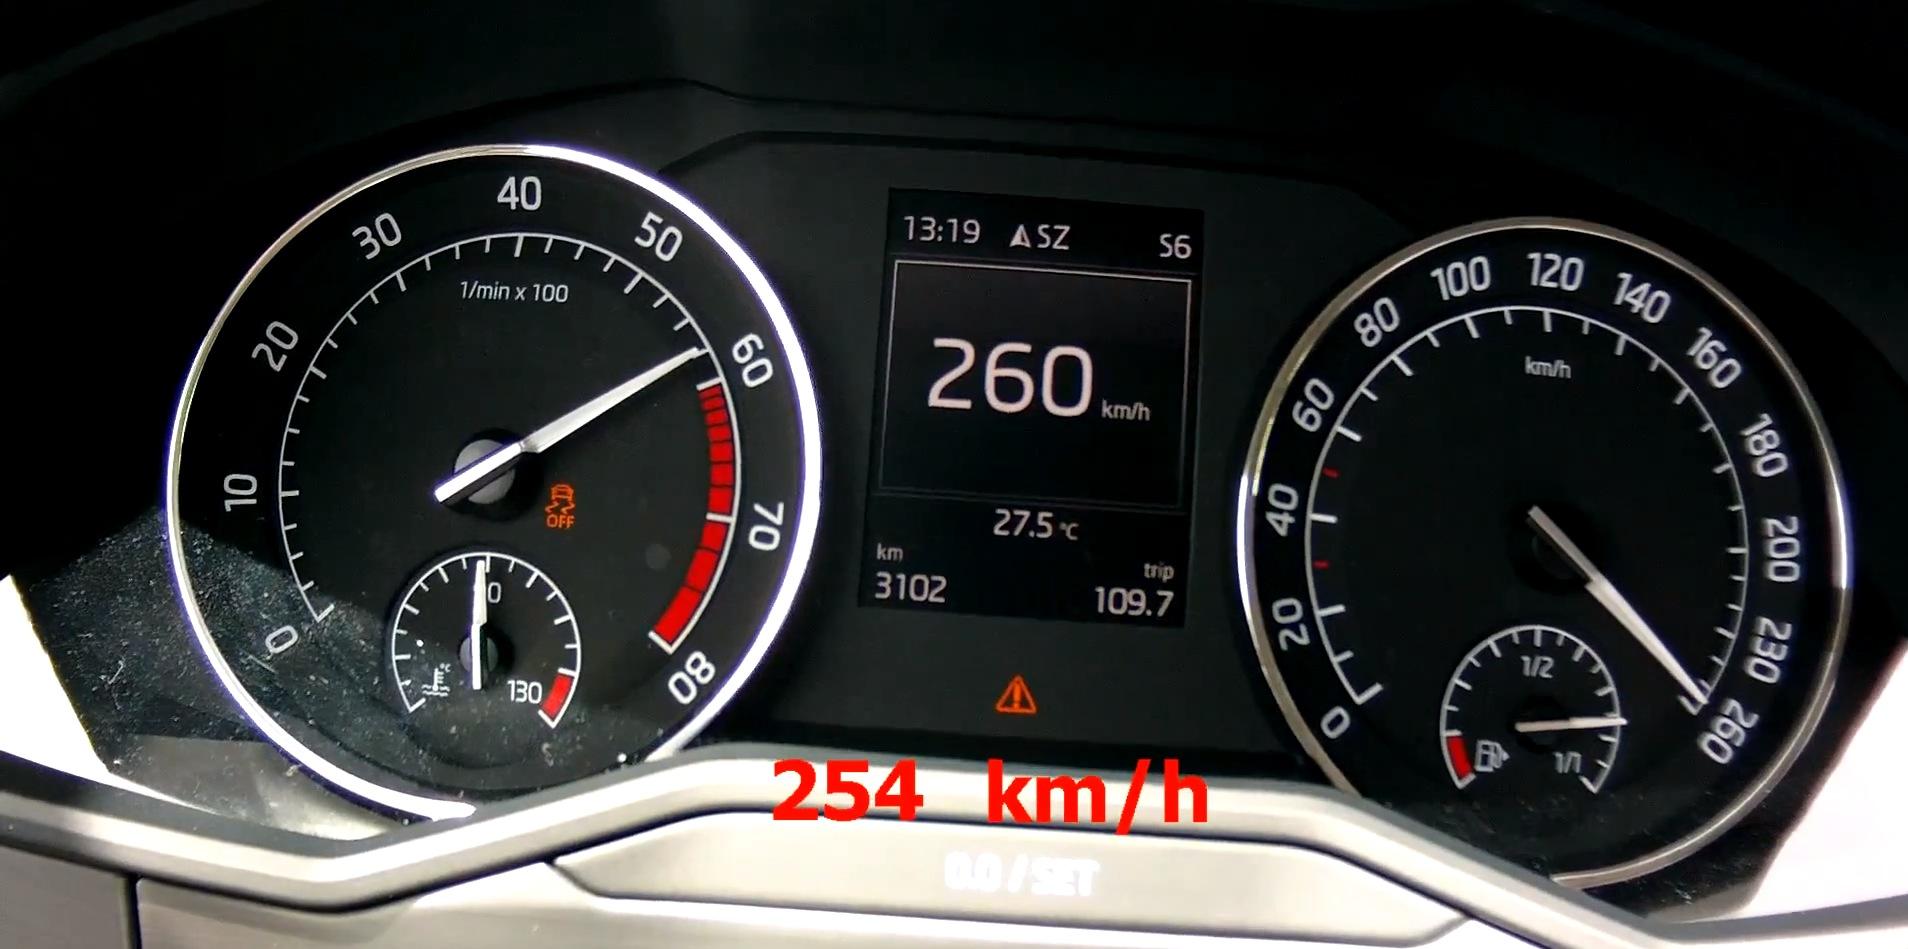 2015 Skoda Superb 2 0 Tsi 280 Hp Acceleration Test Autoevolution